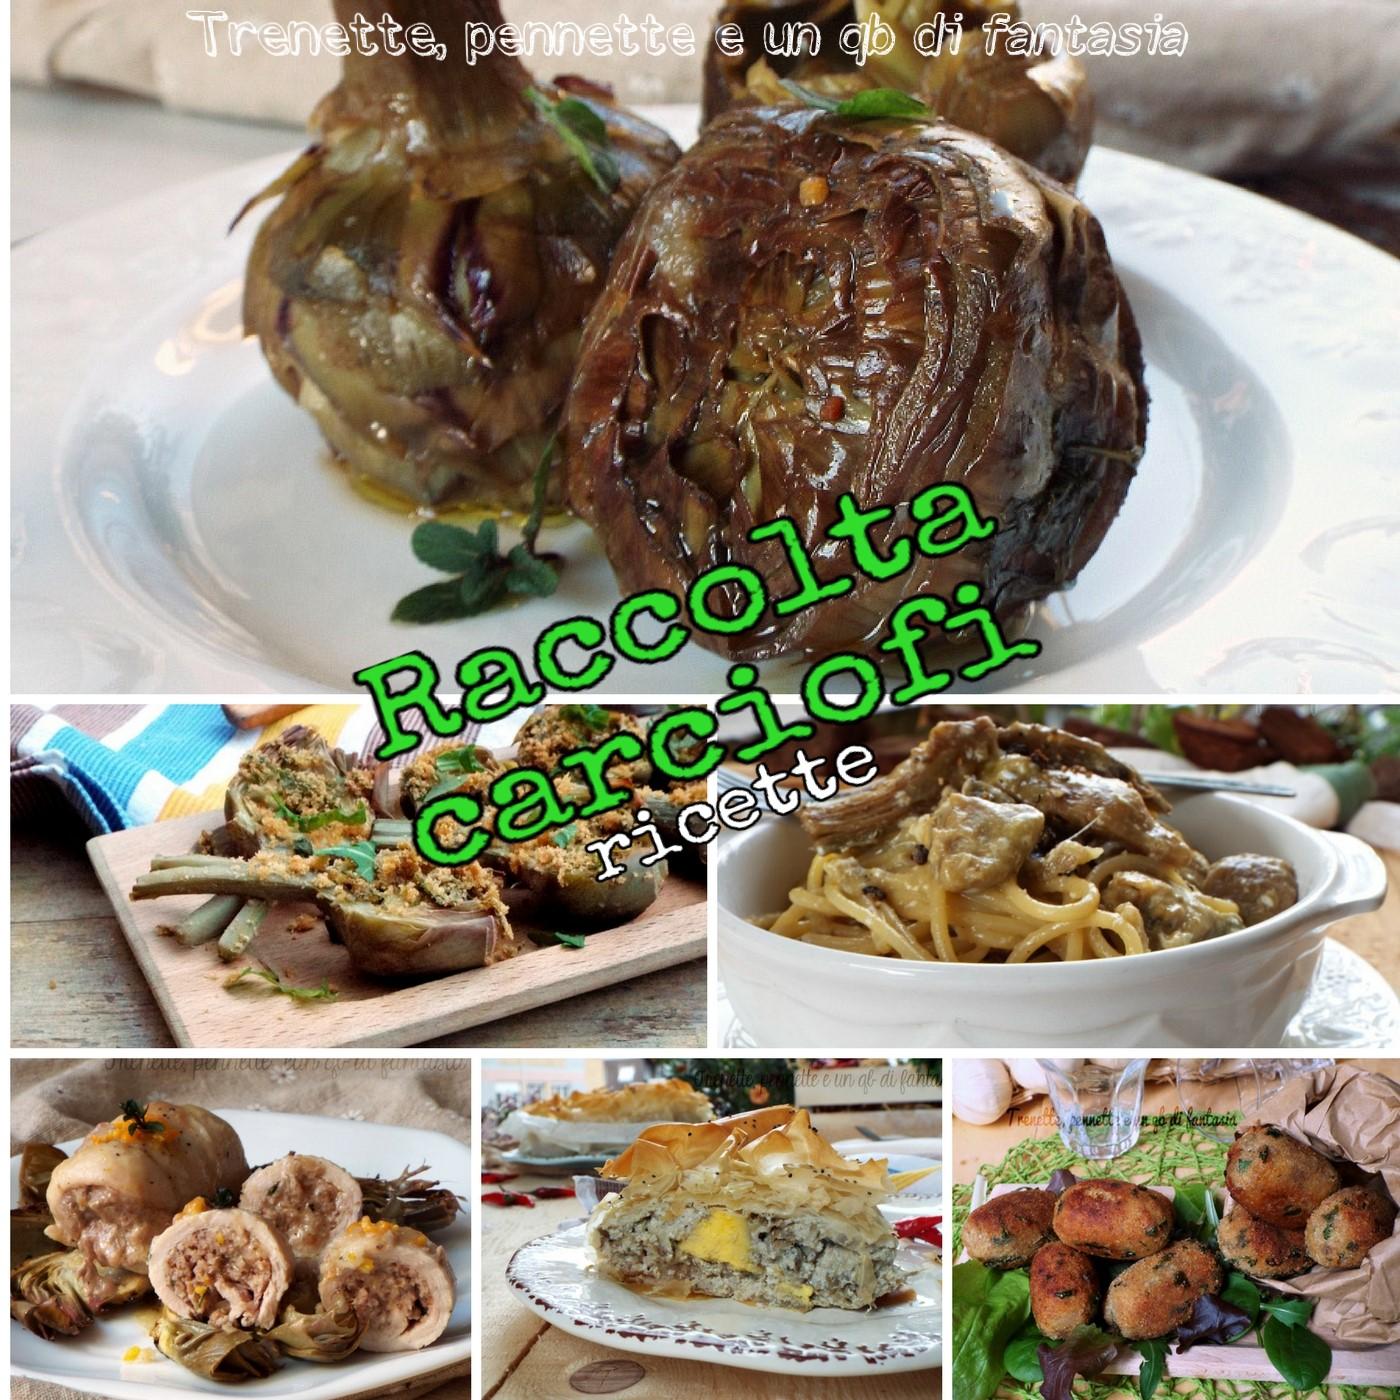 Raccolta carciofi ricette